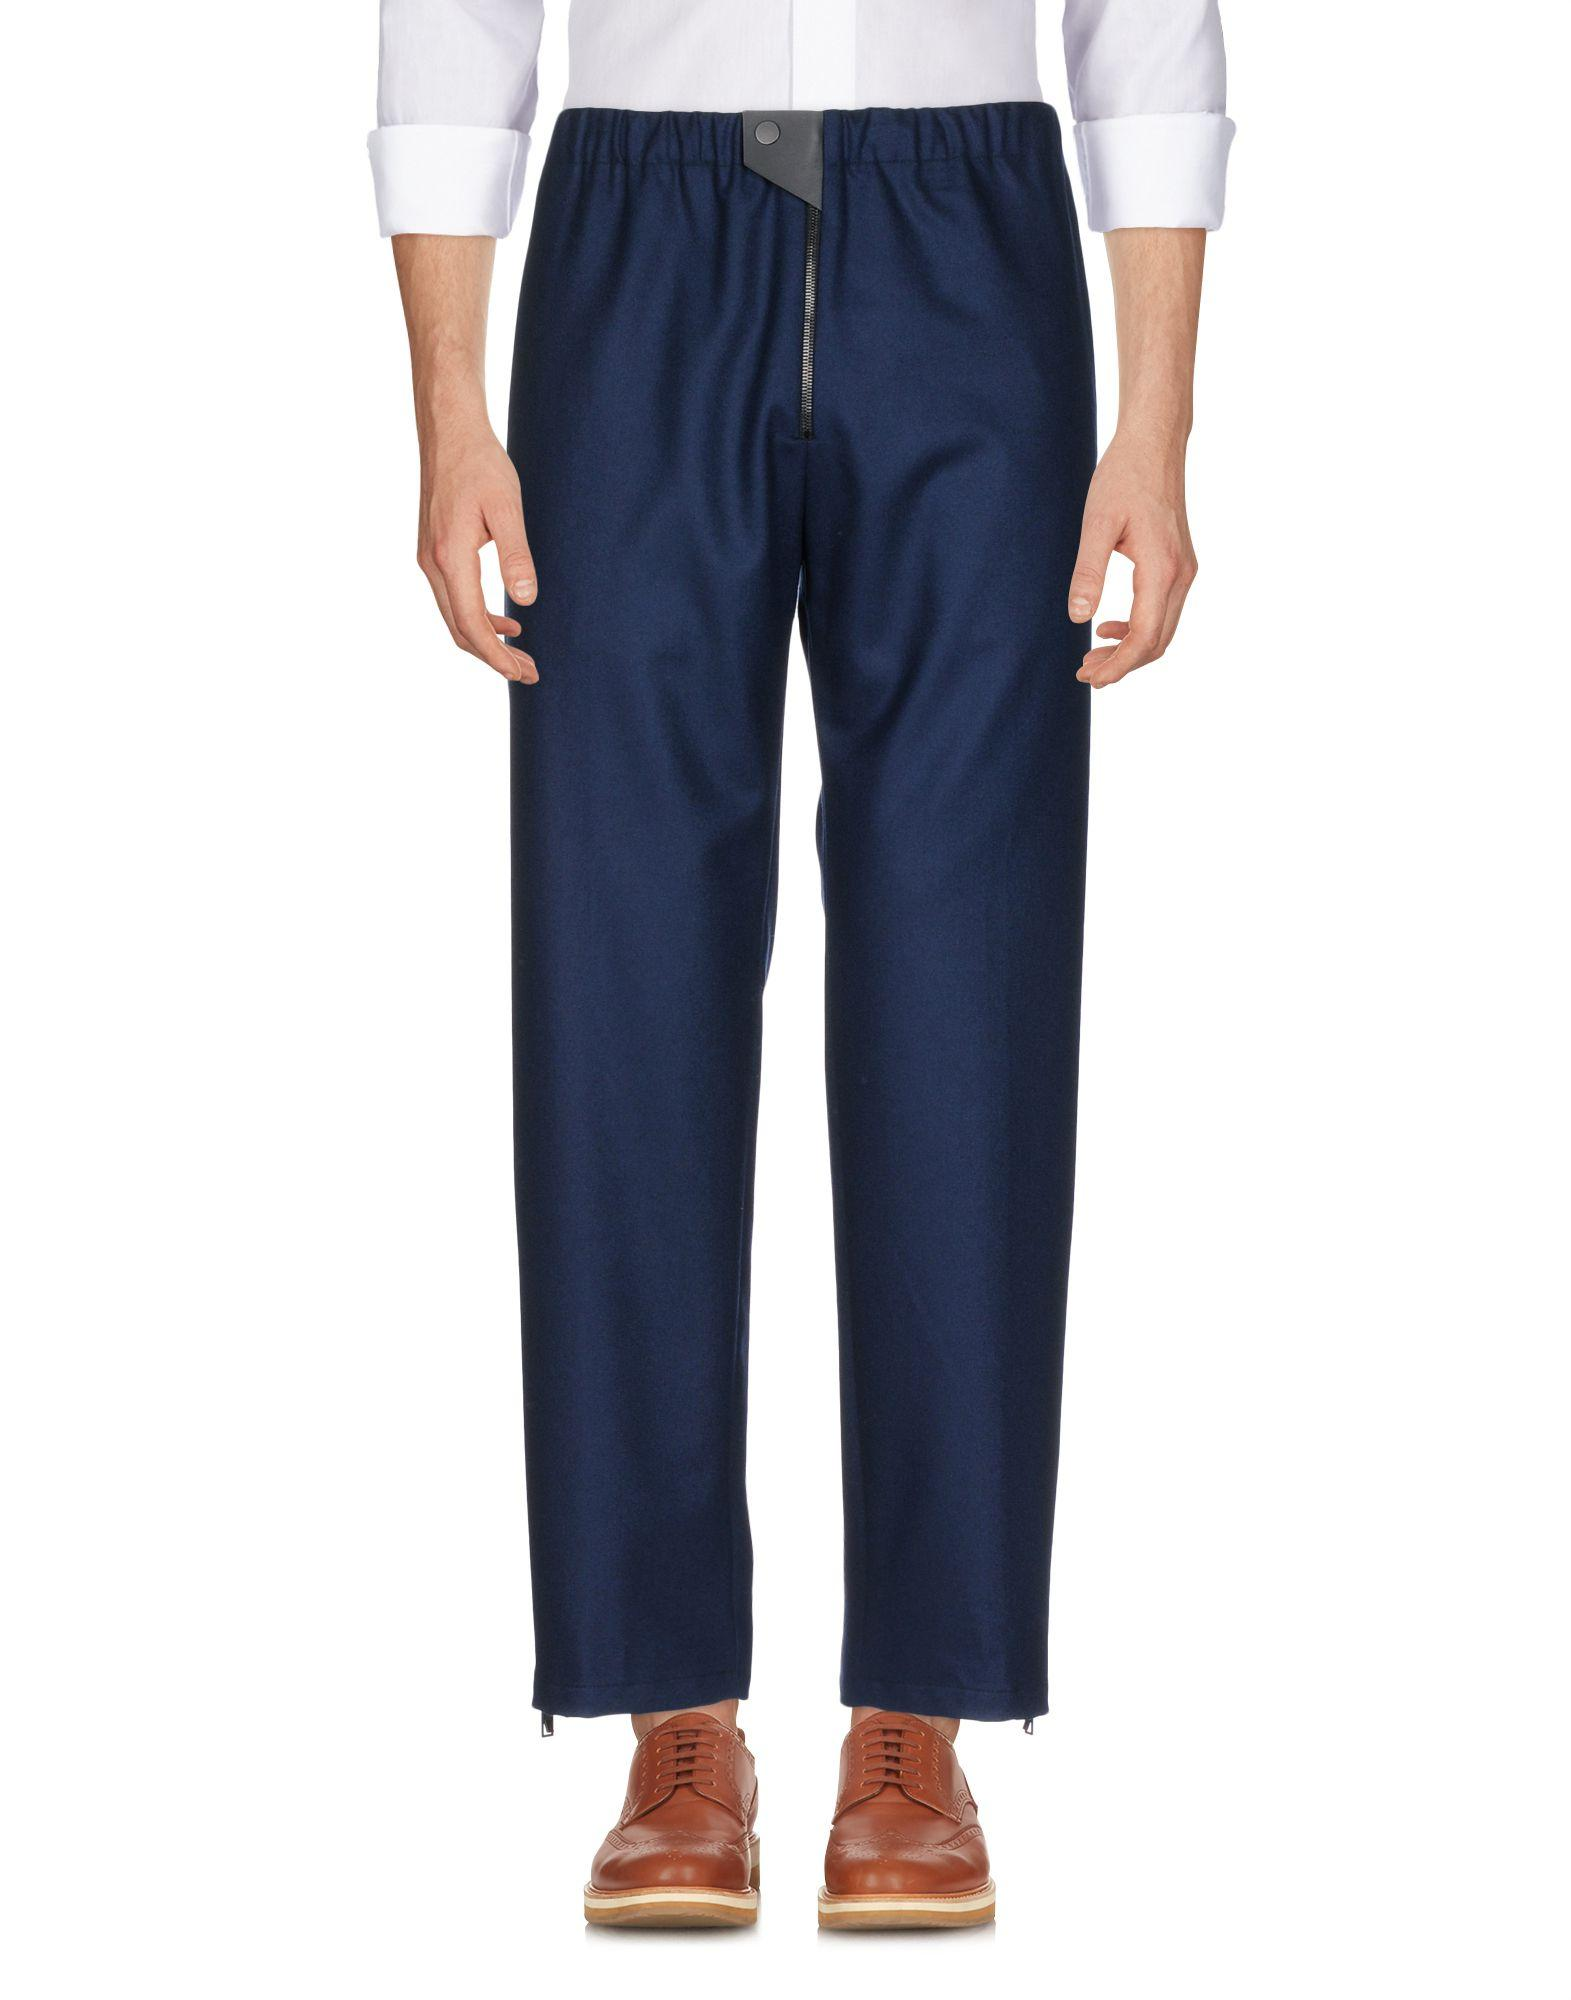 Balenciaga Casual Pants In Dark Blue